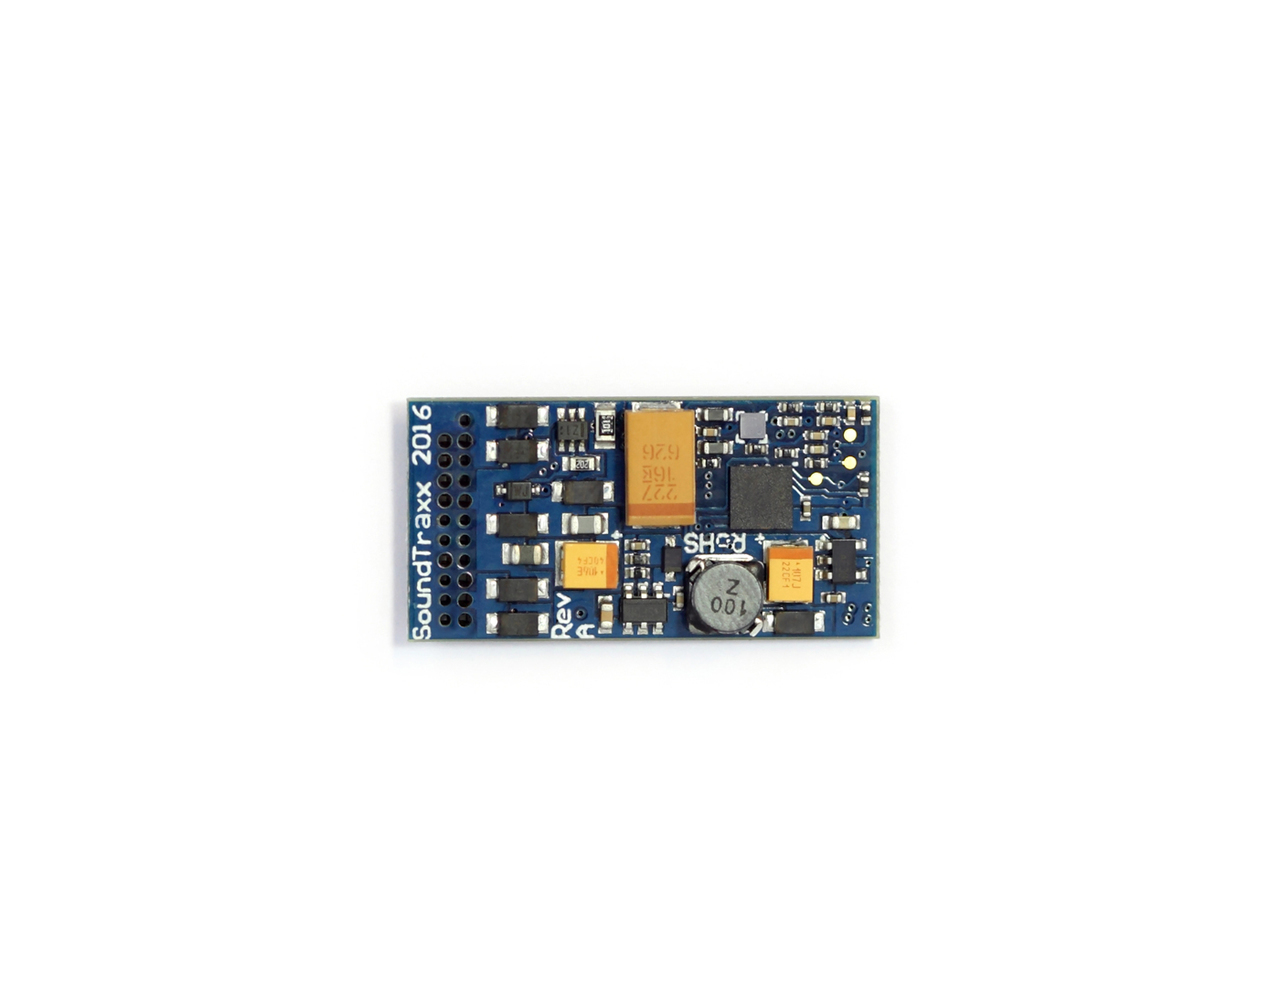 Soundtraxx 886003 HO Tsunami 2 TSU-21 Pin PNEM Digital Sound Decoder for Electric Models